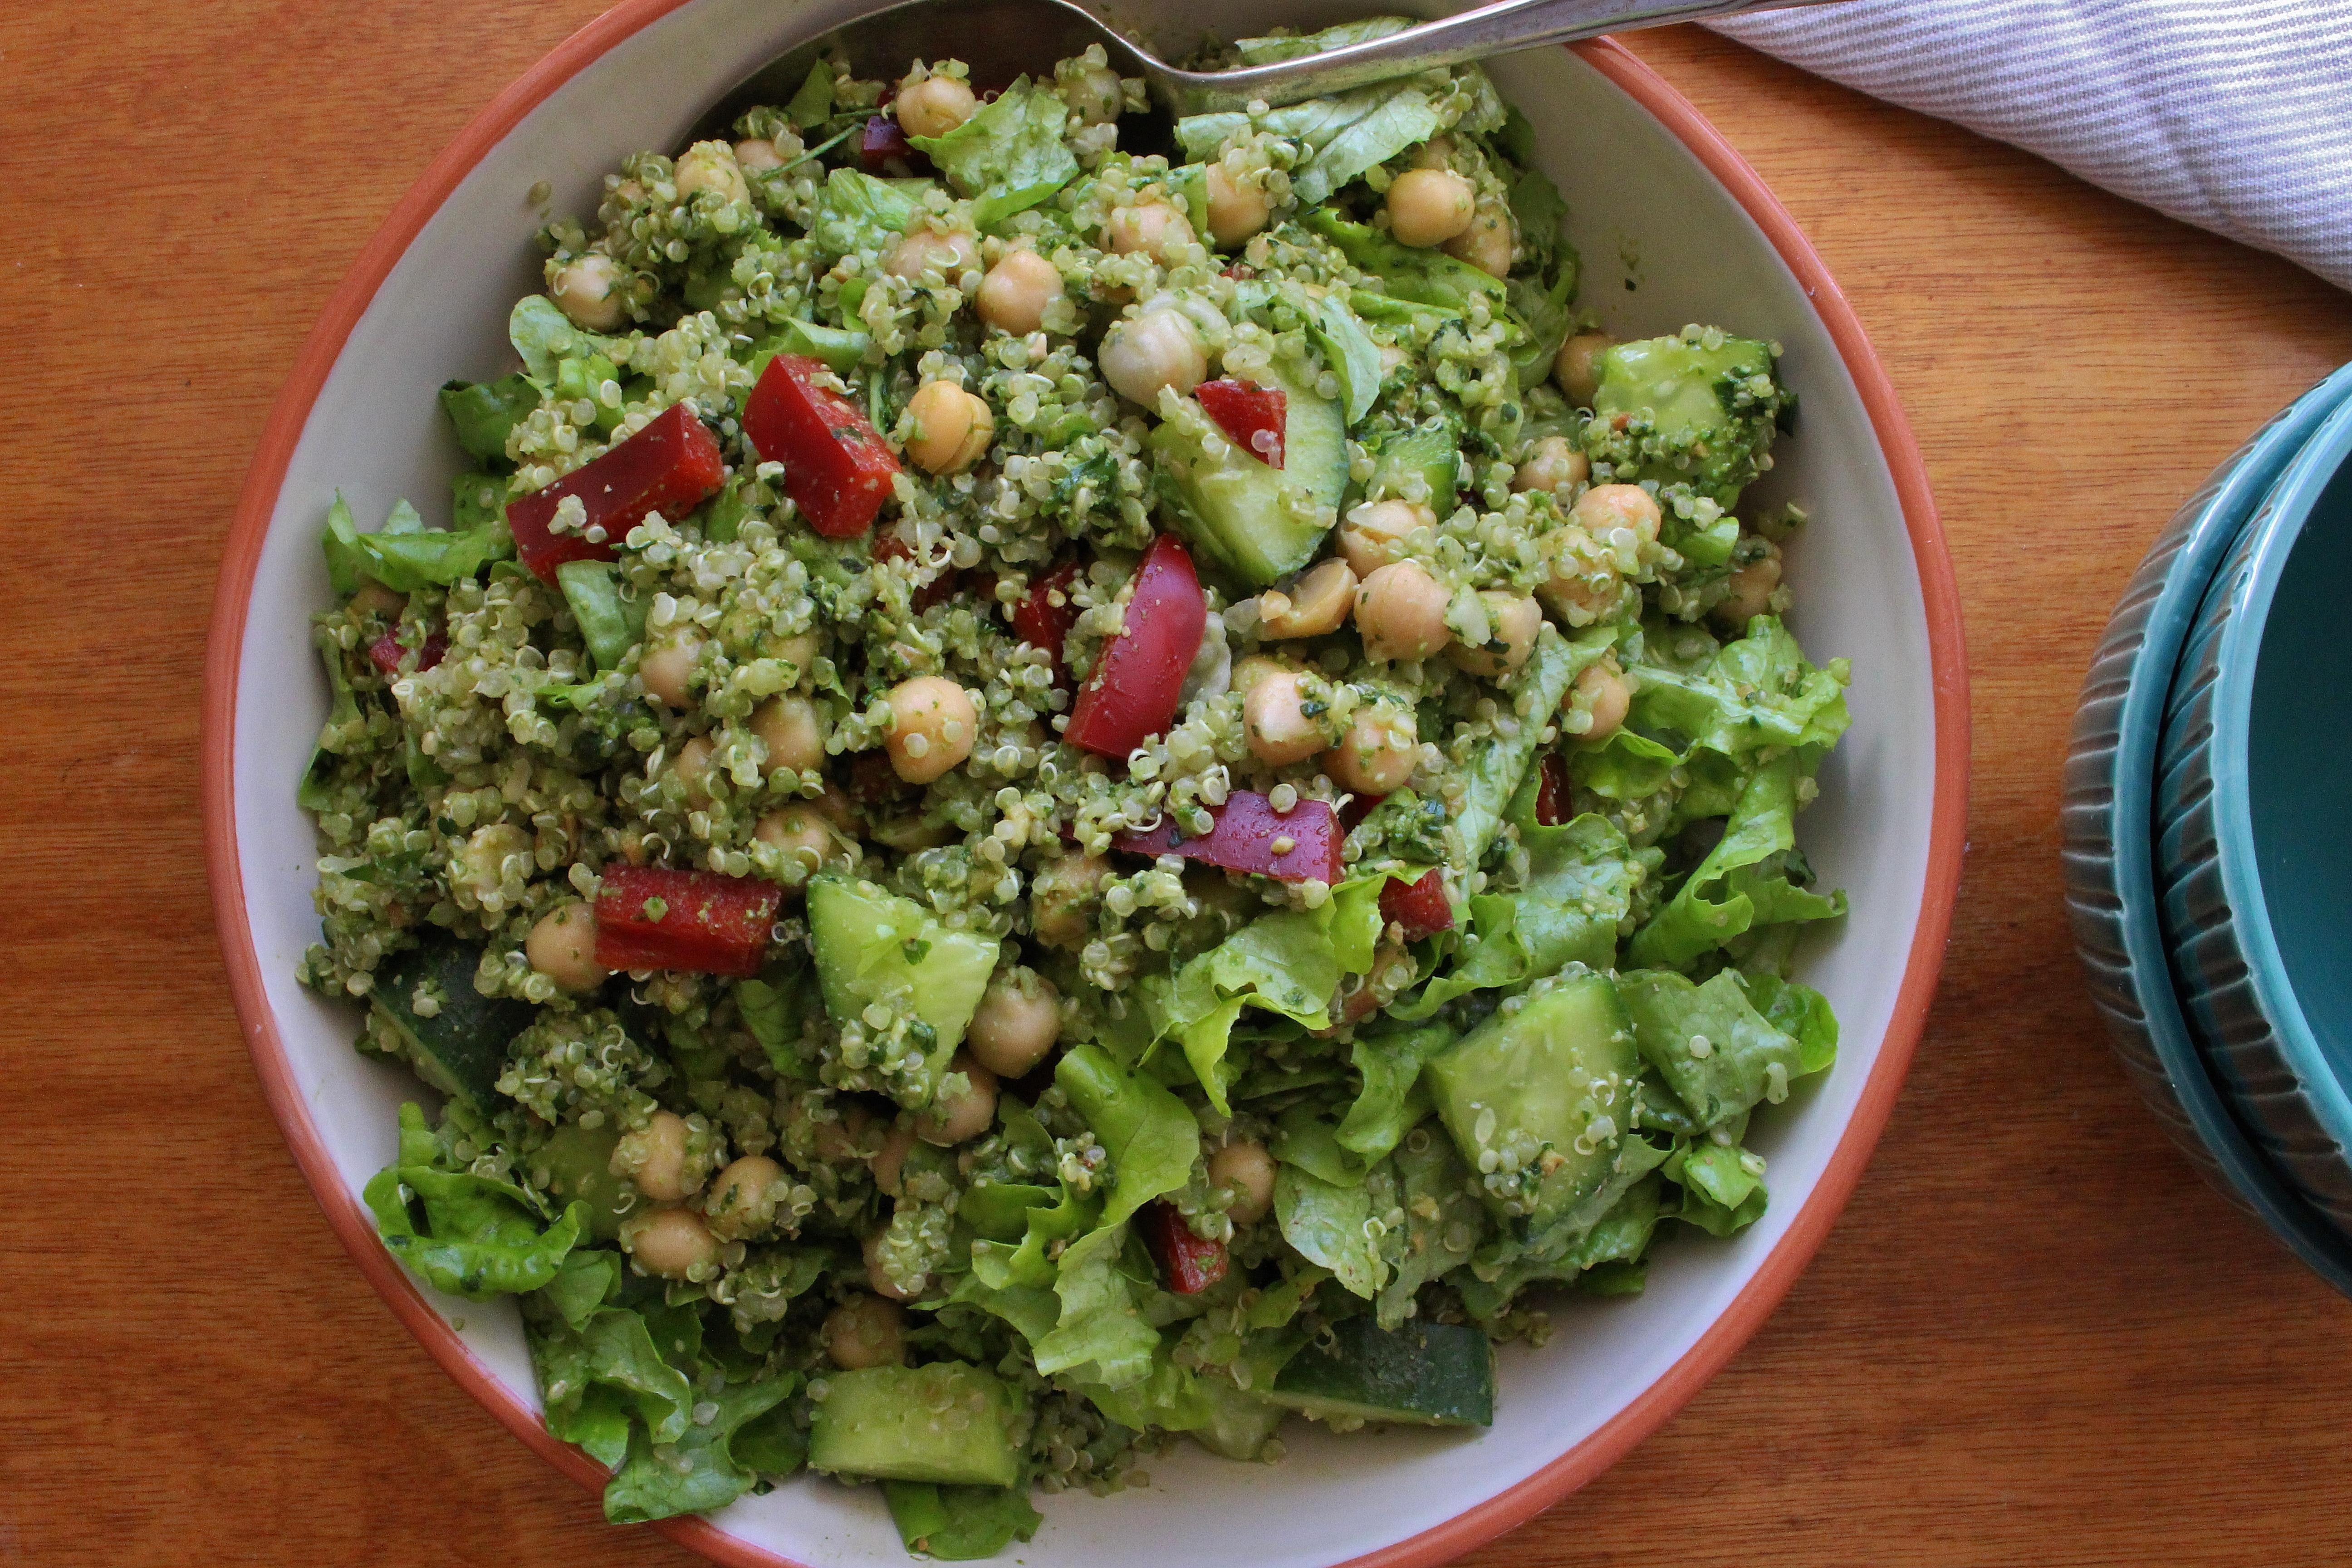 Coriander Cashew Pesto Quinoa Salad (gluten free, vegan